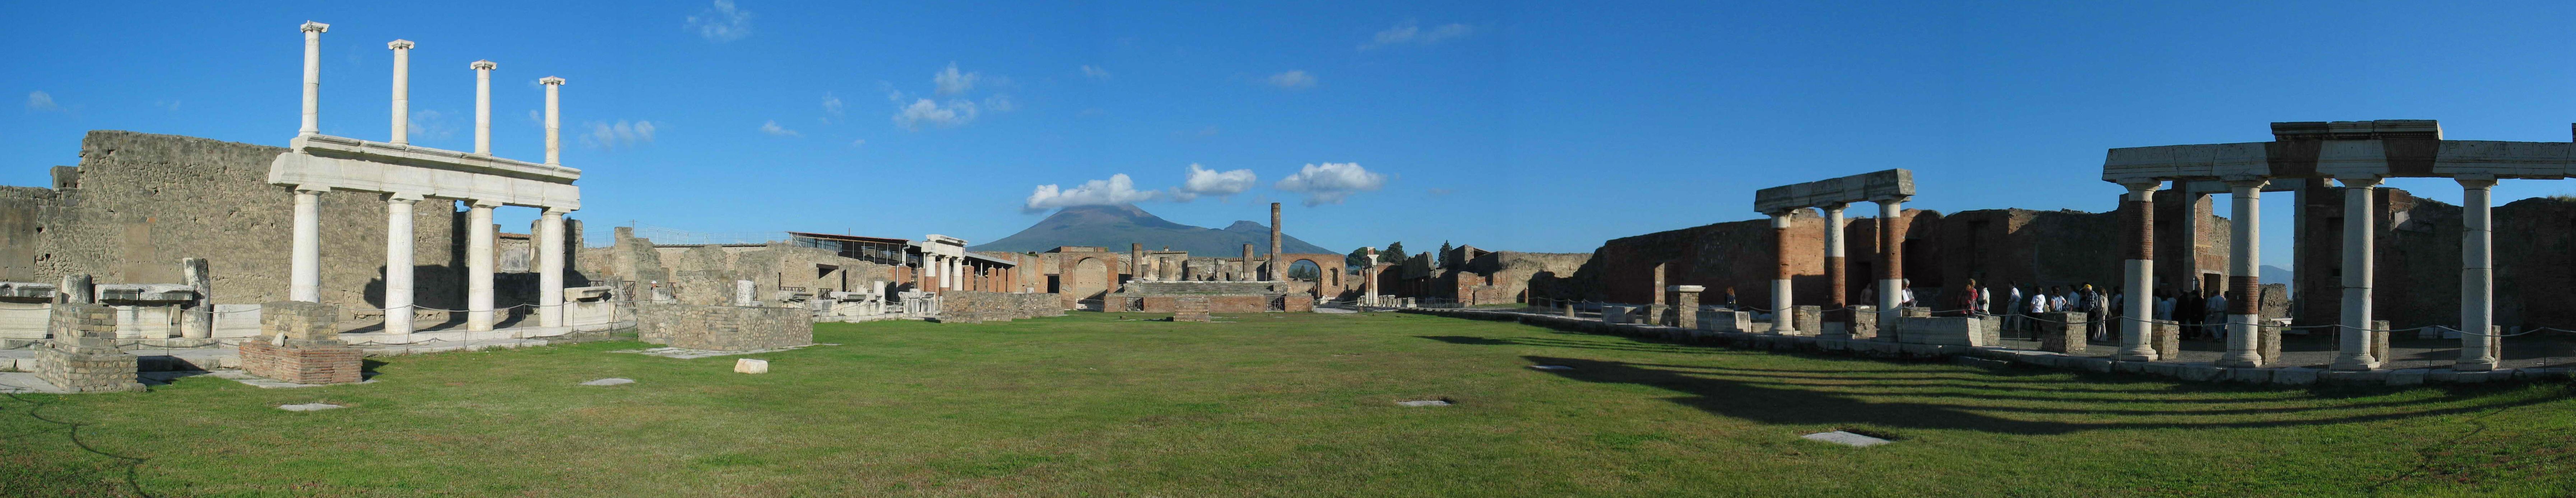 the forum pompeii Travel forums for pompeii discuss pompeii travel with tripadvisor travelers.